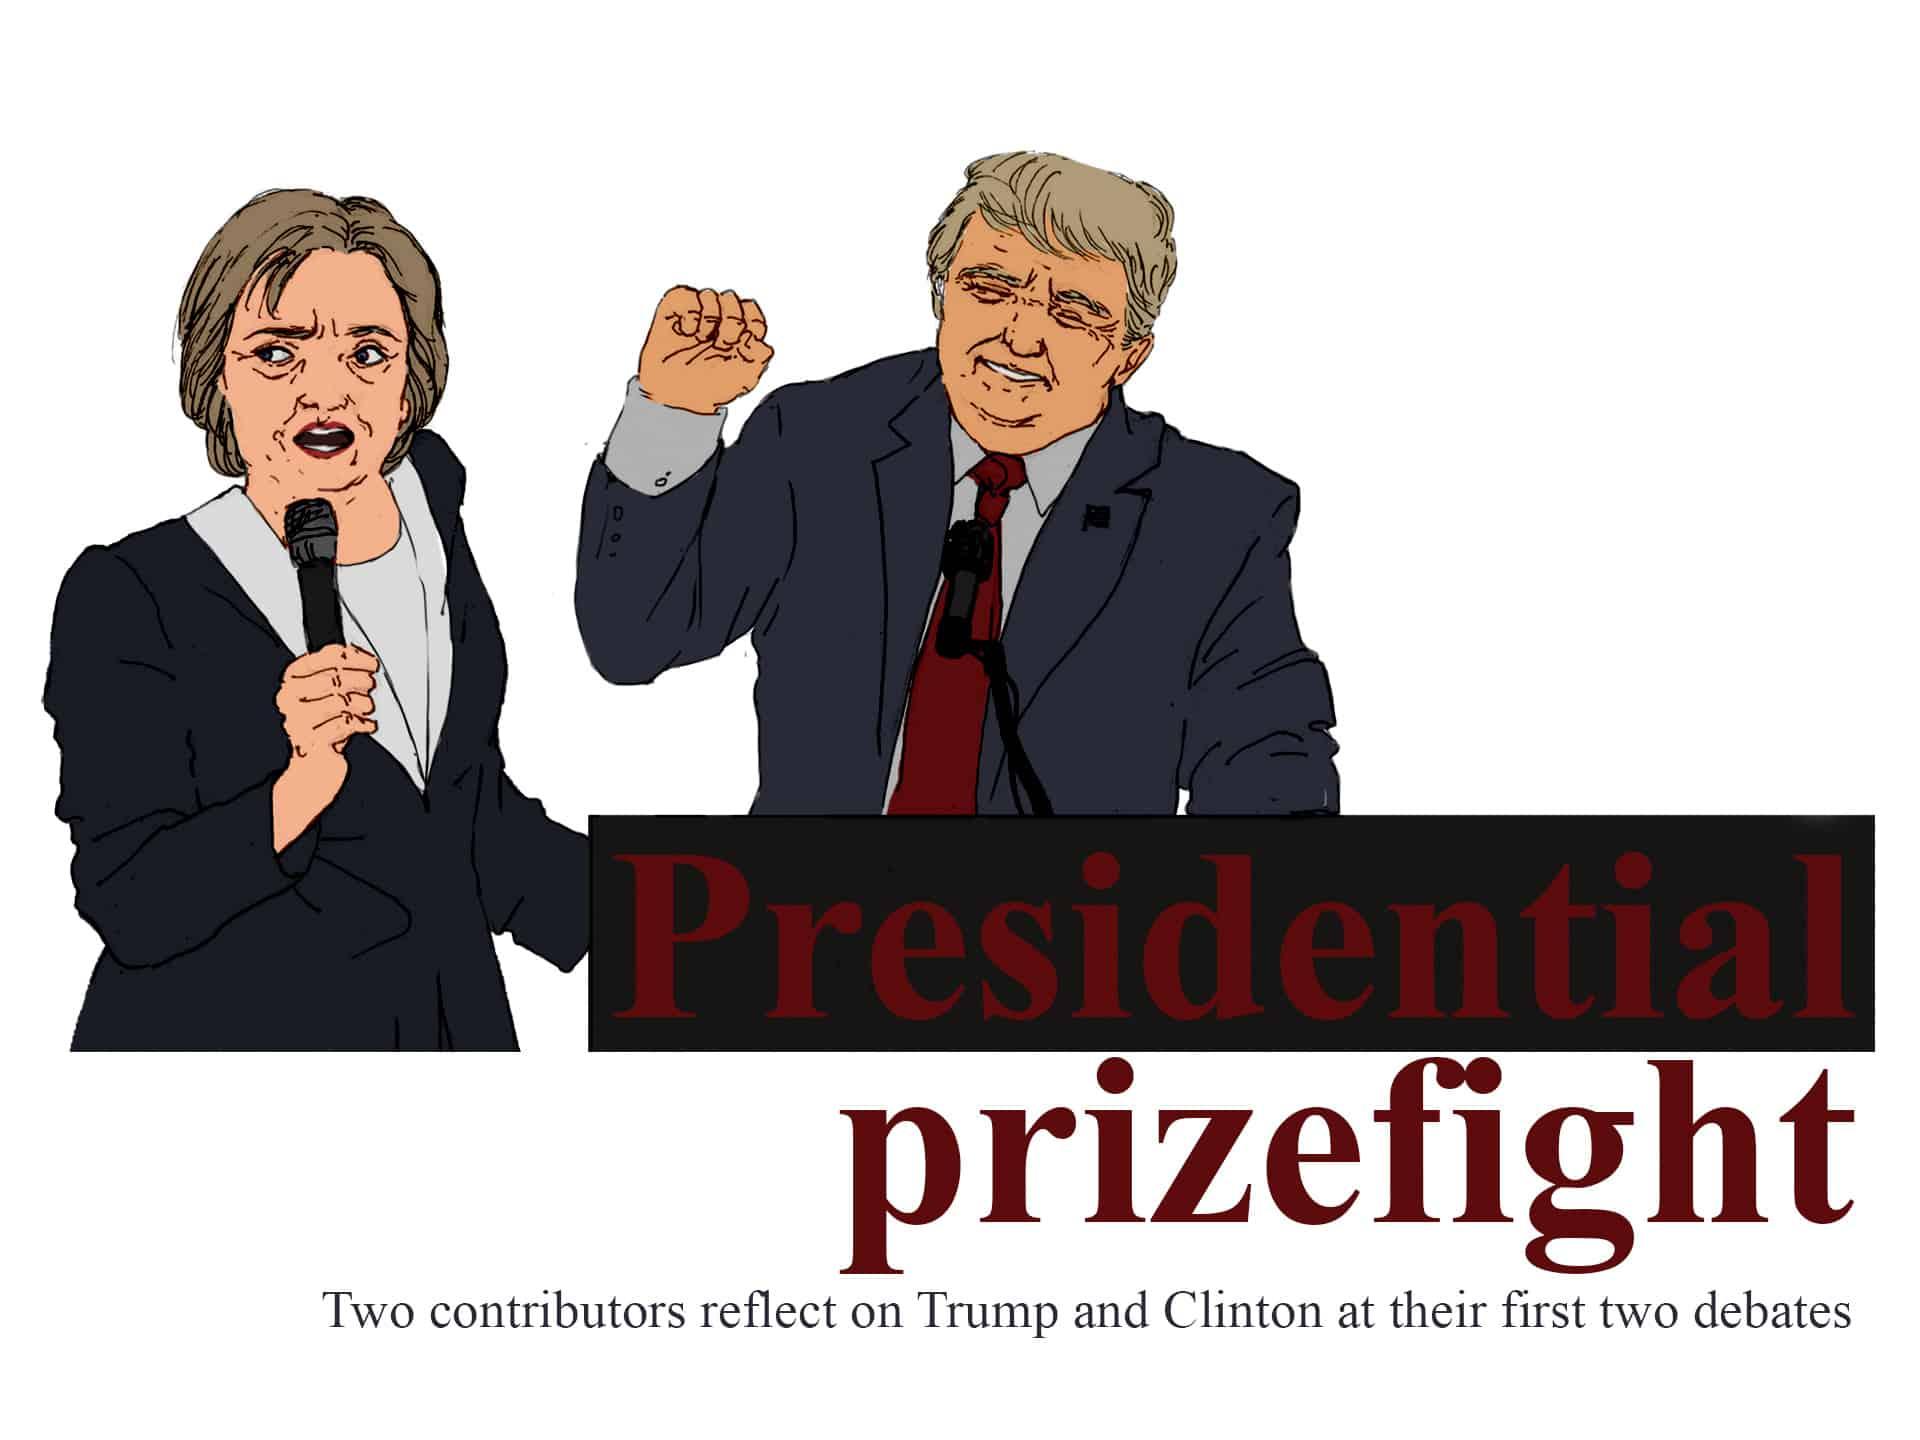 Presidential prizefight